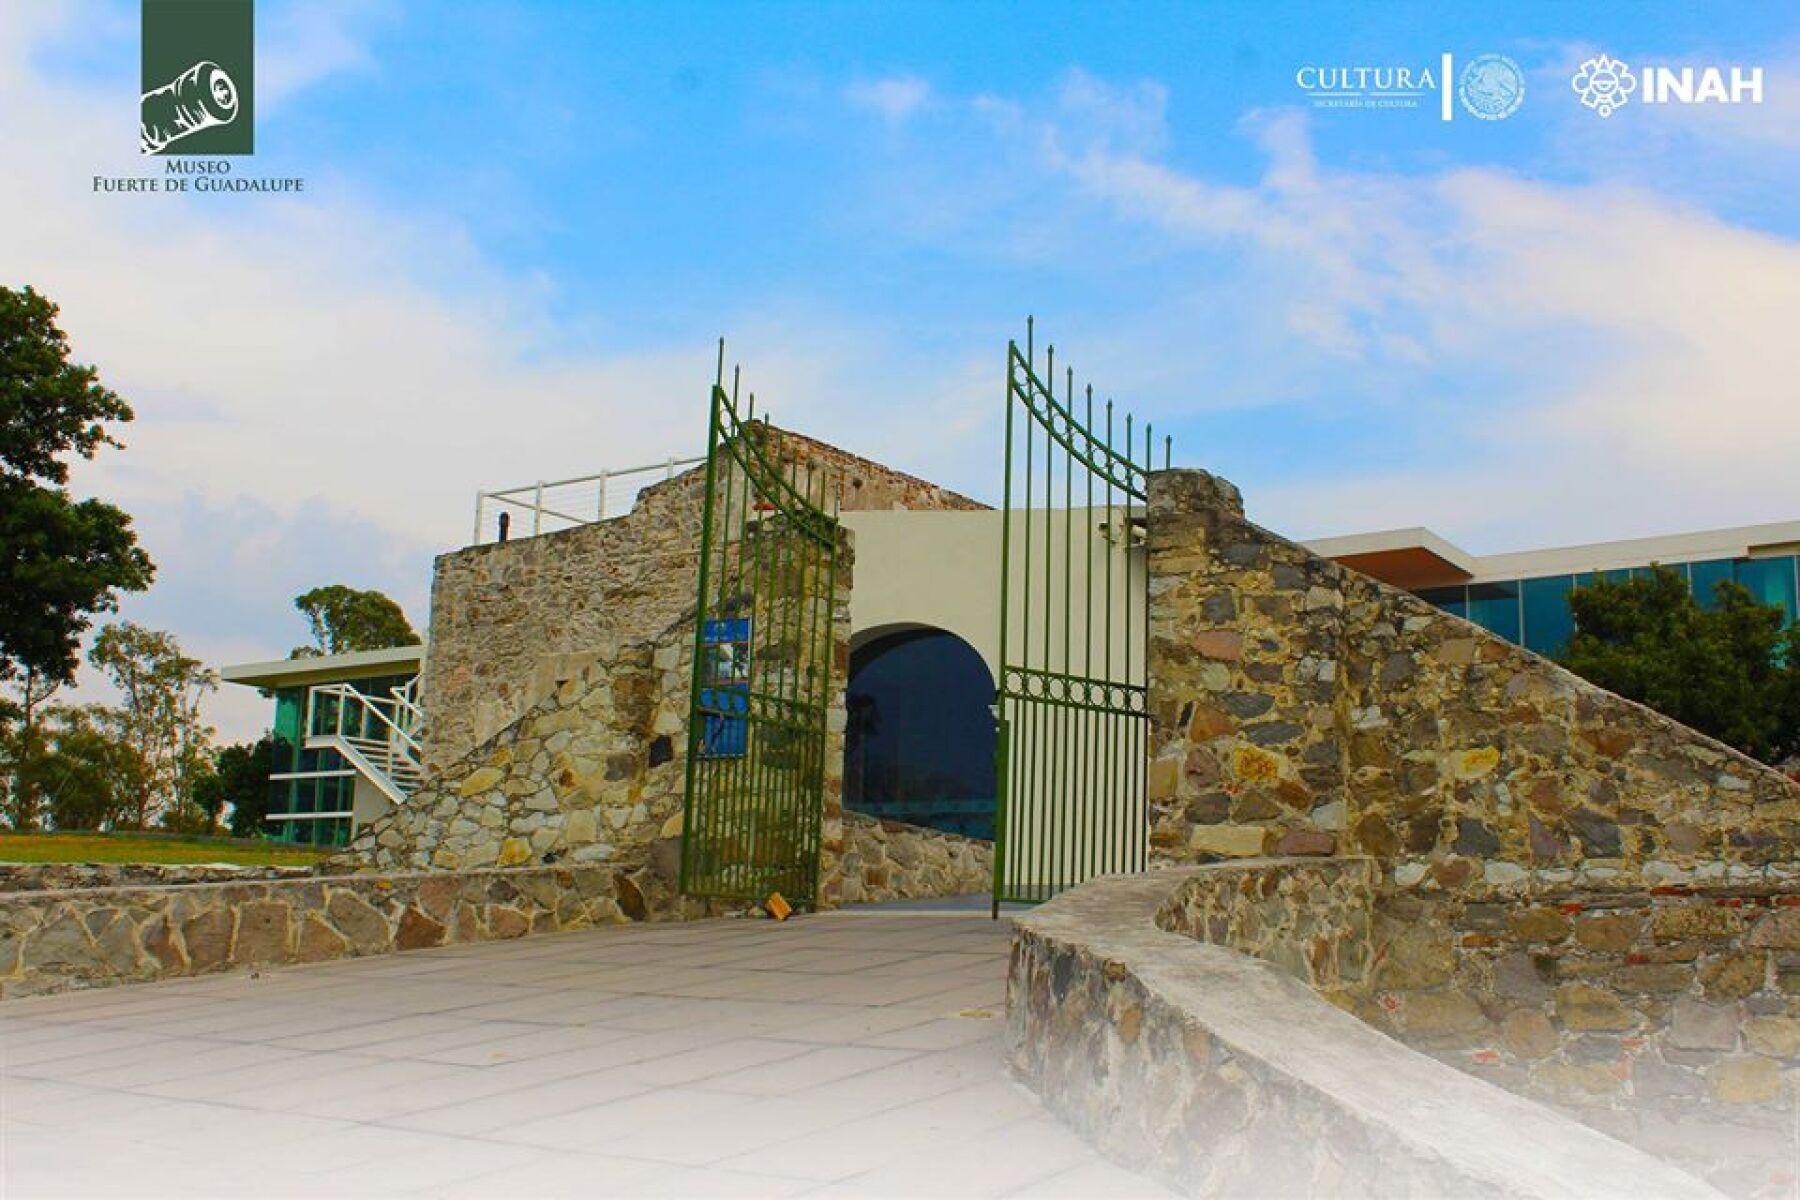 Museo Fuerte de Guadalupe